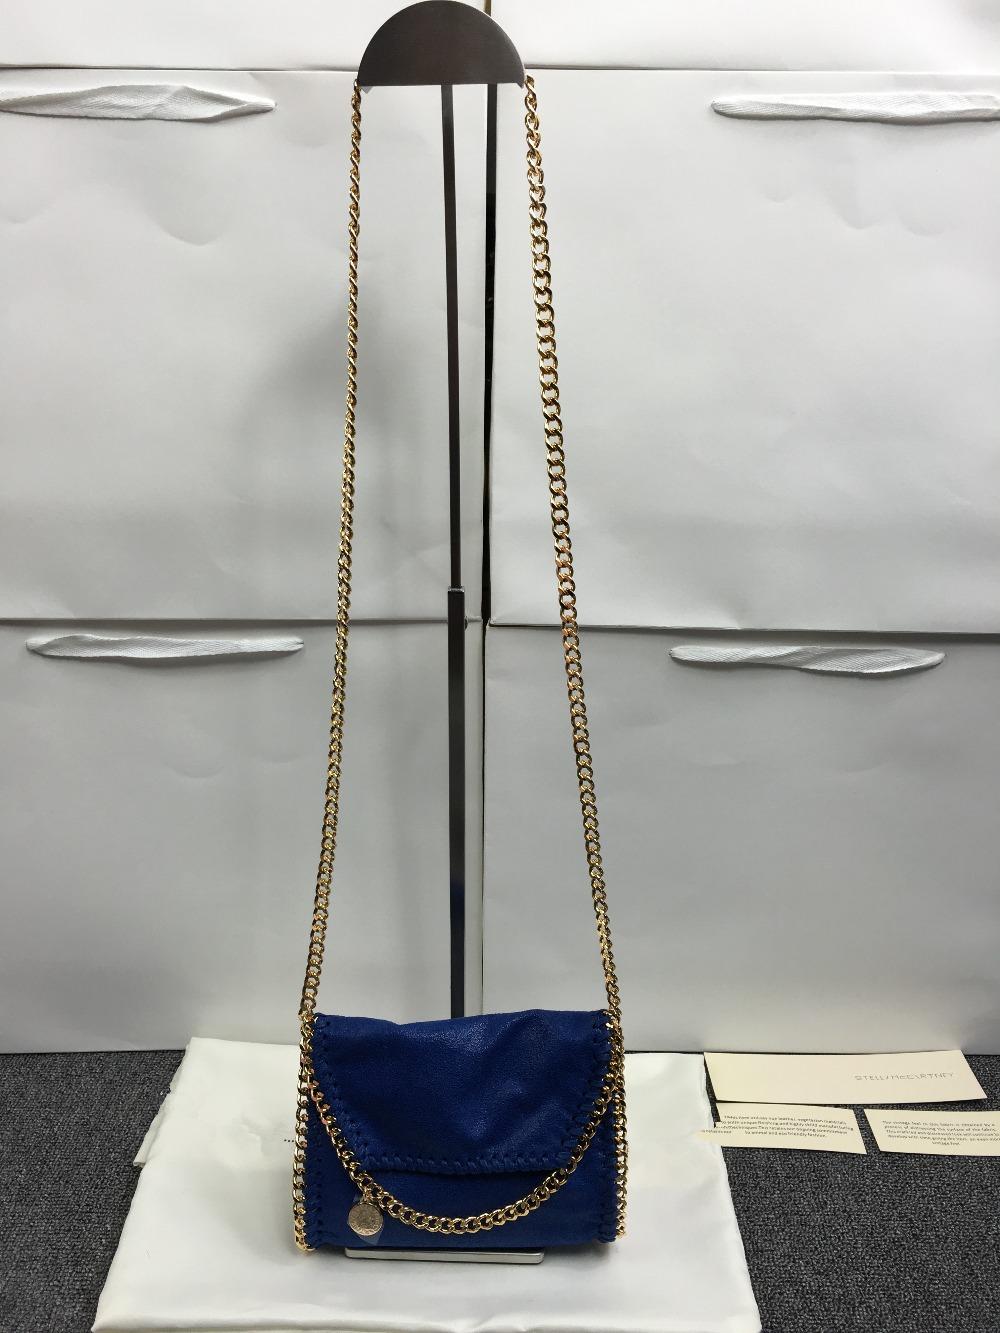 Фотография mini LADY personal bag S*T Shoulder Messenger chain GOLD CHAIN handbag original material PVC star package